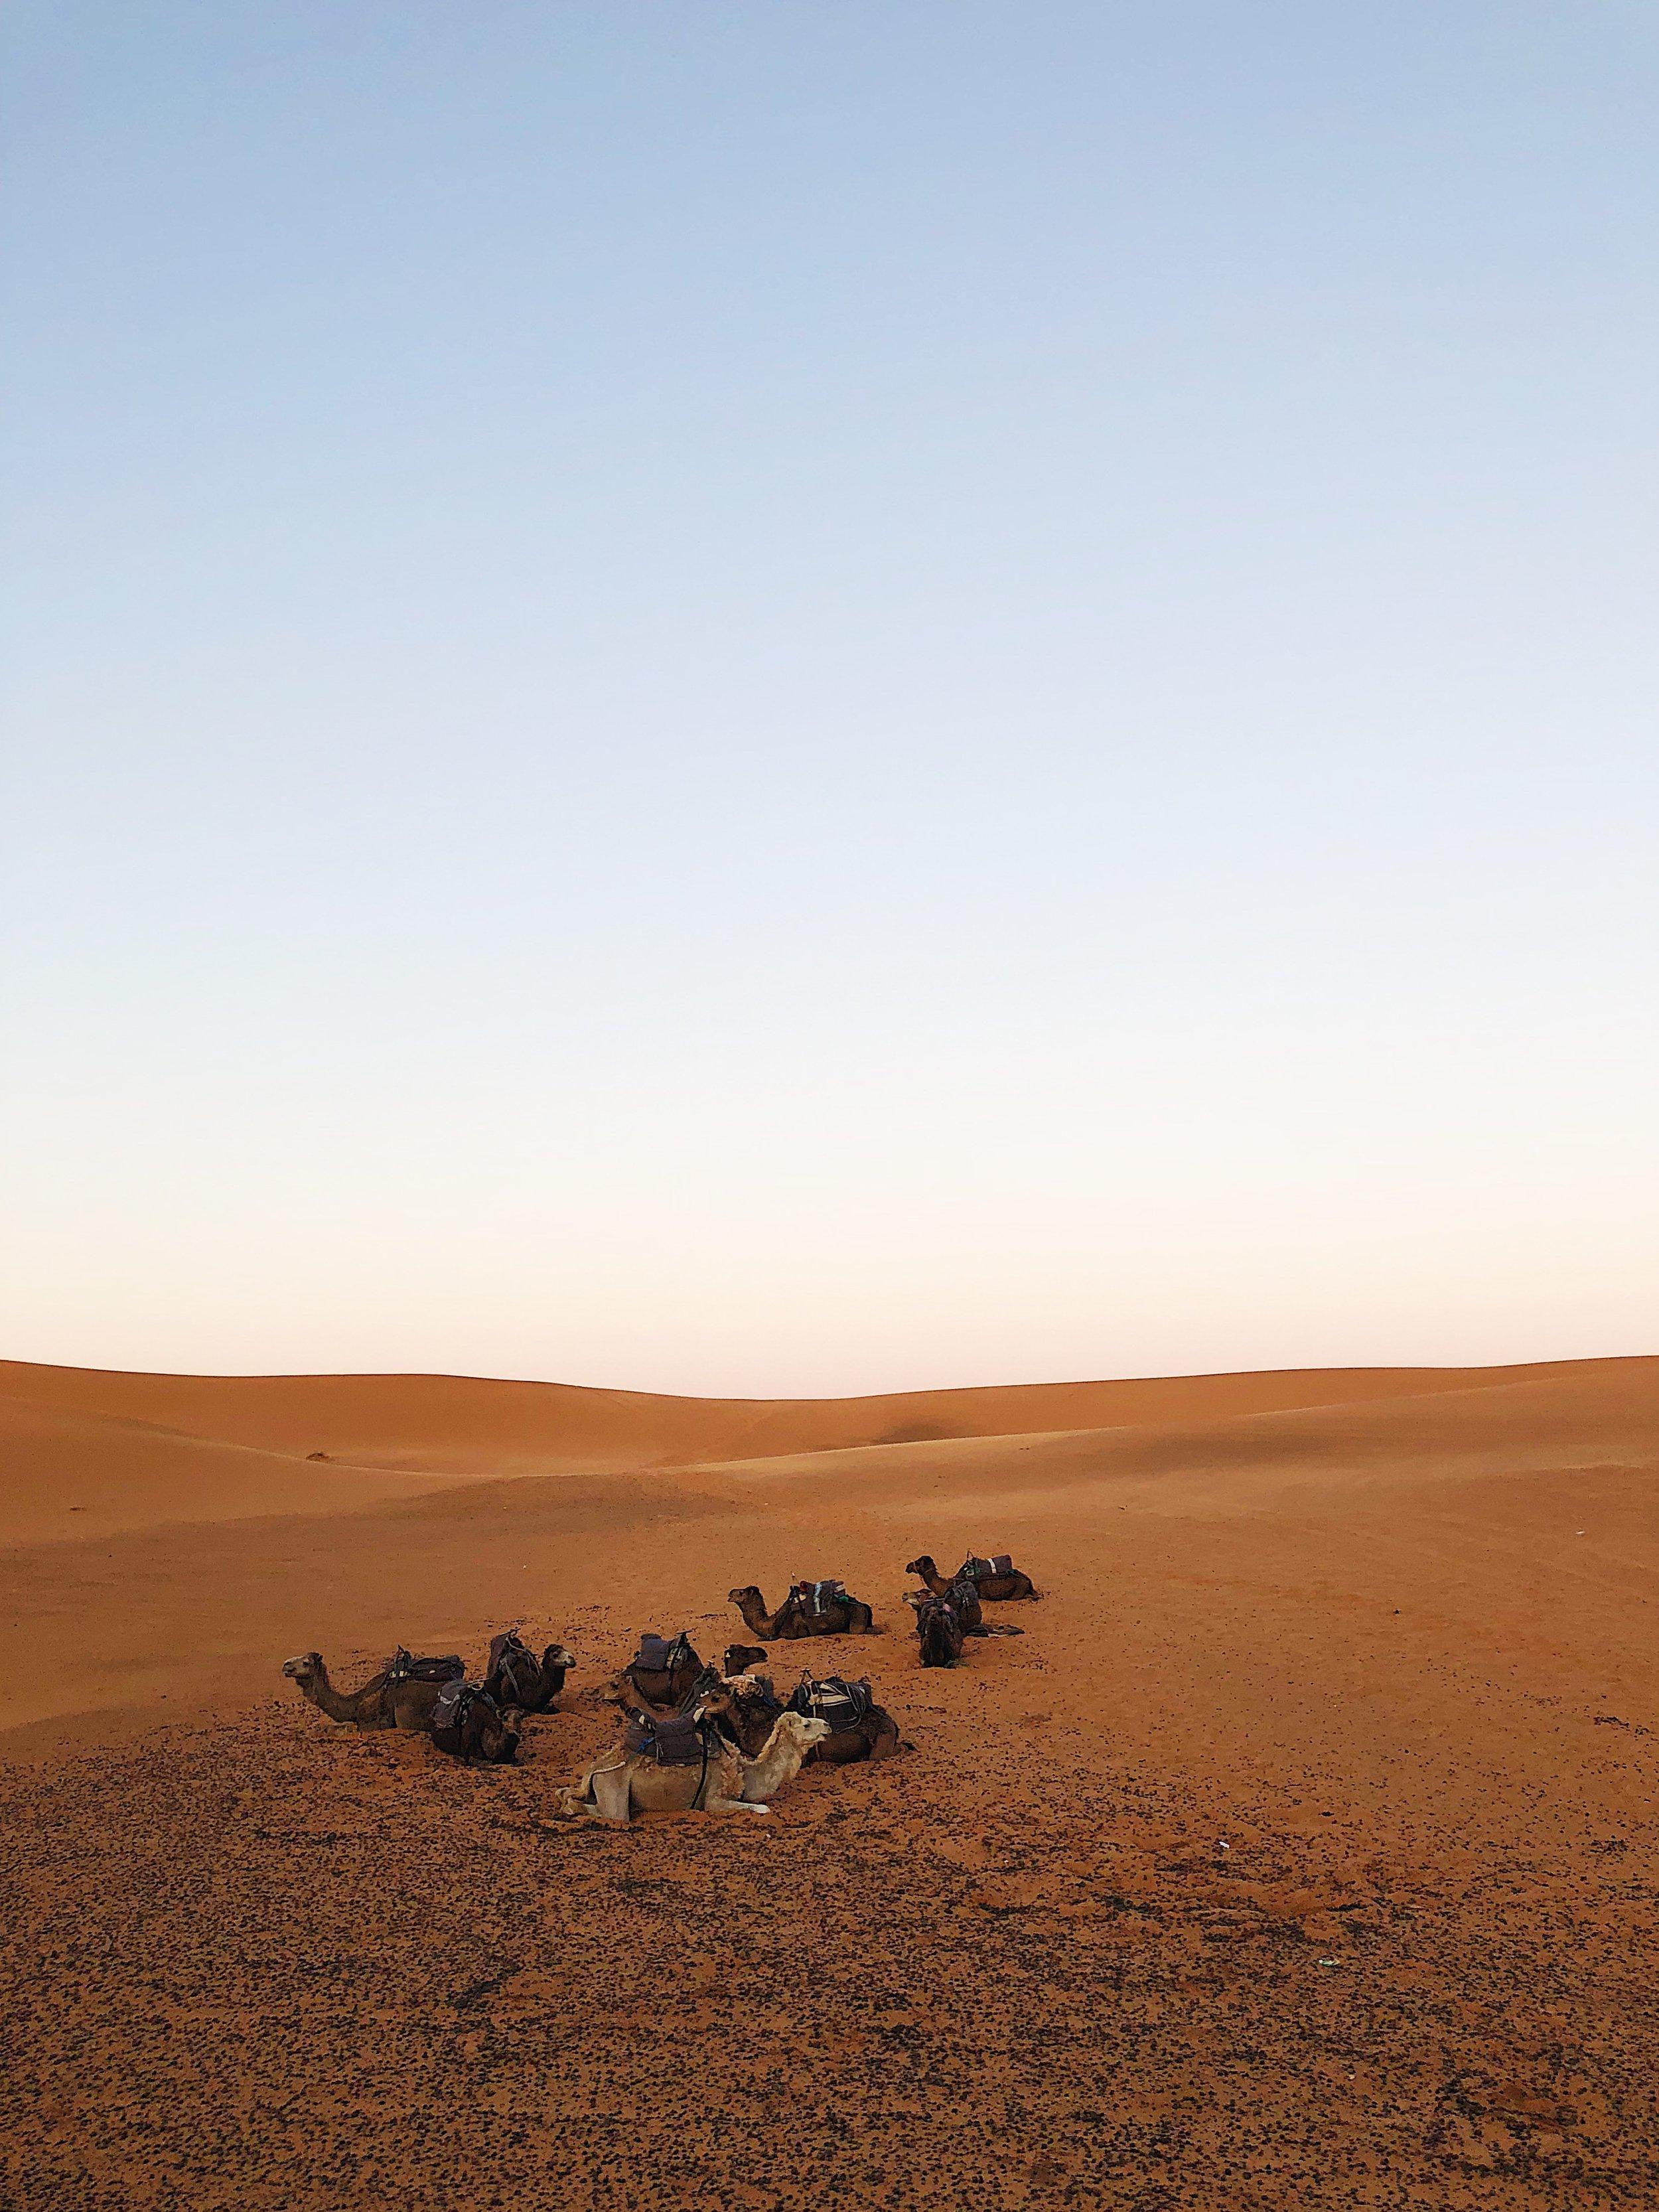 Merzouga, Sahara Desert